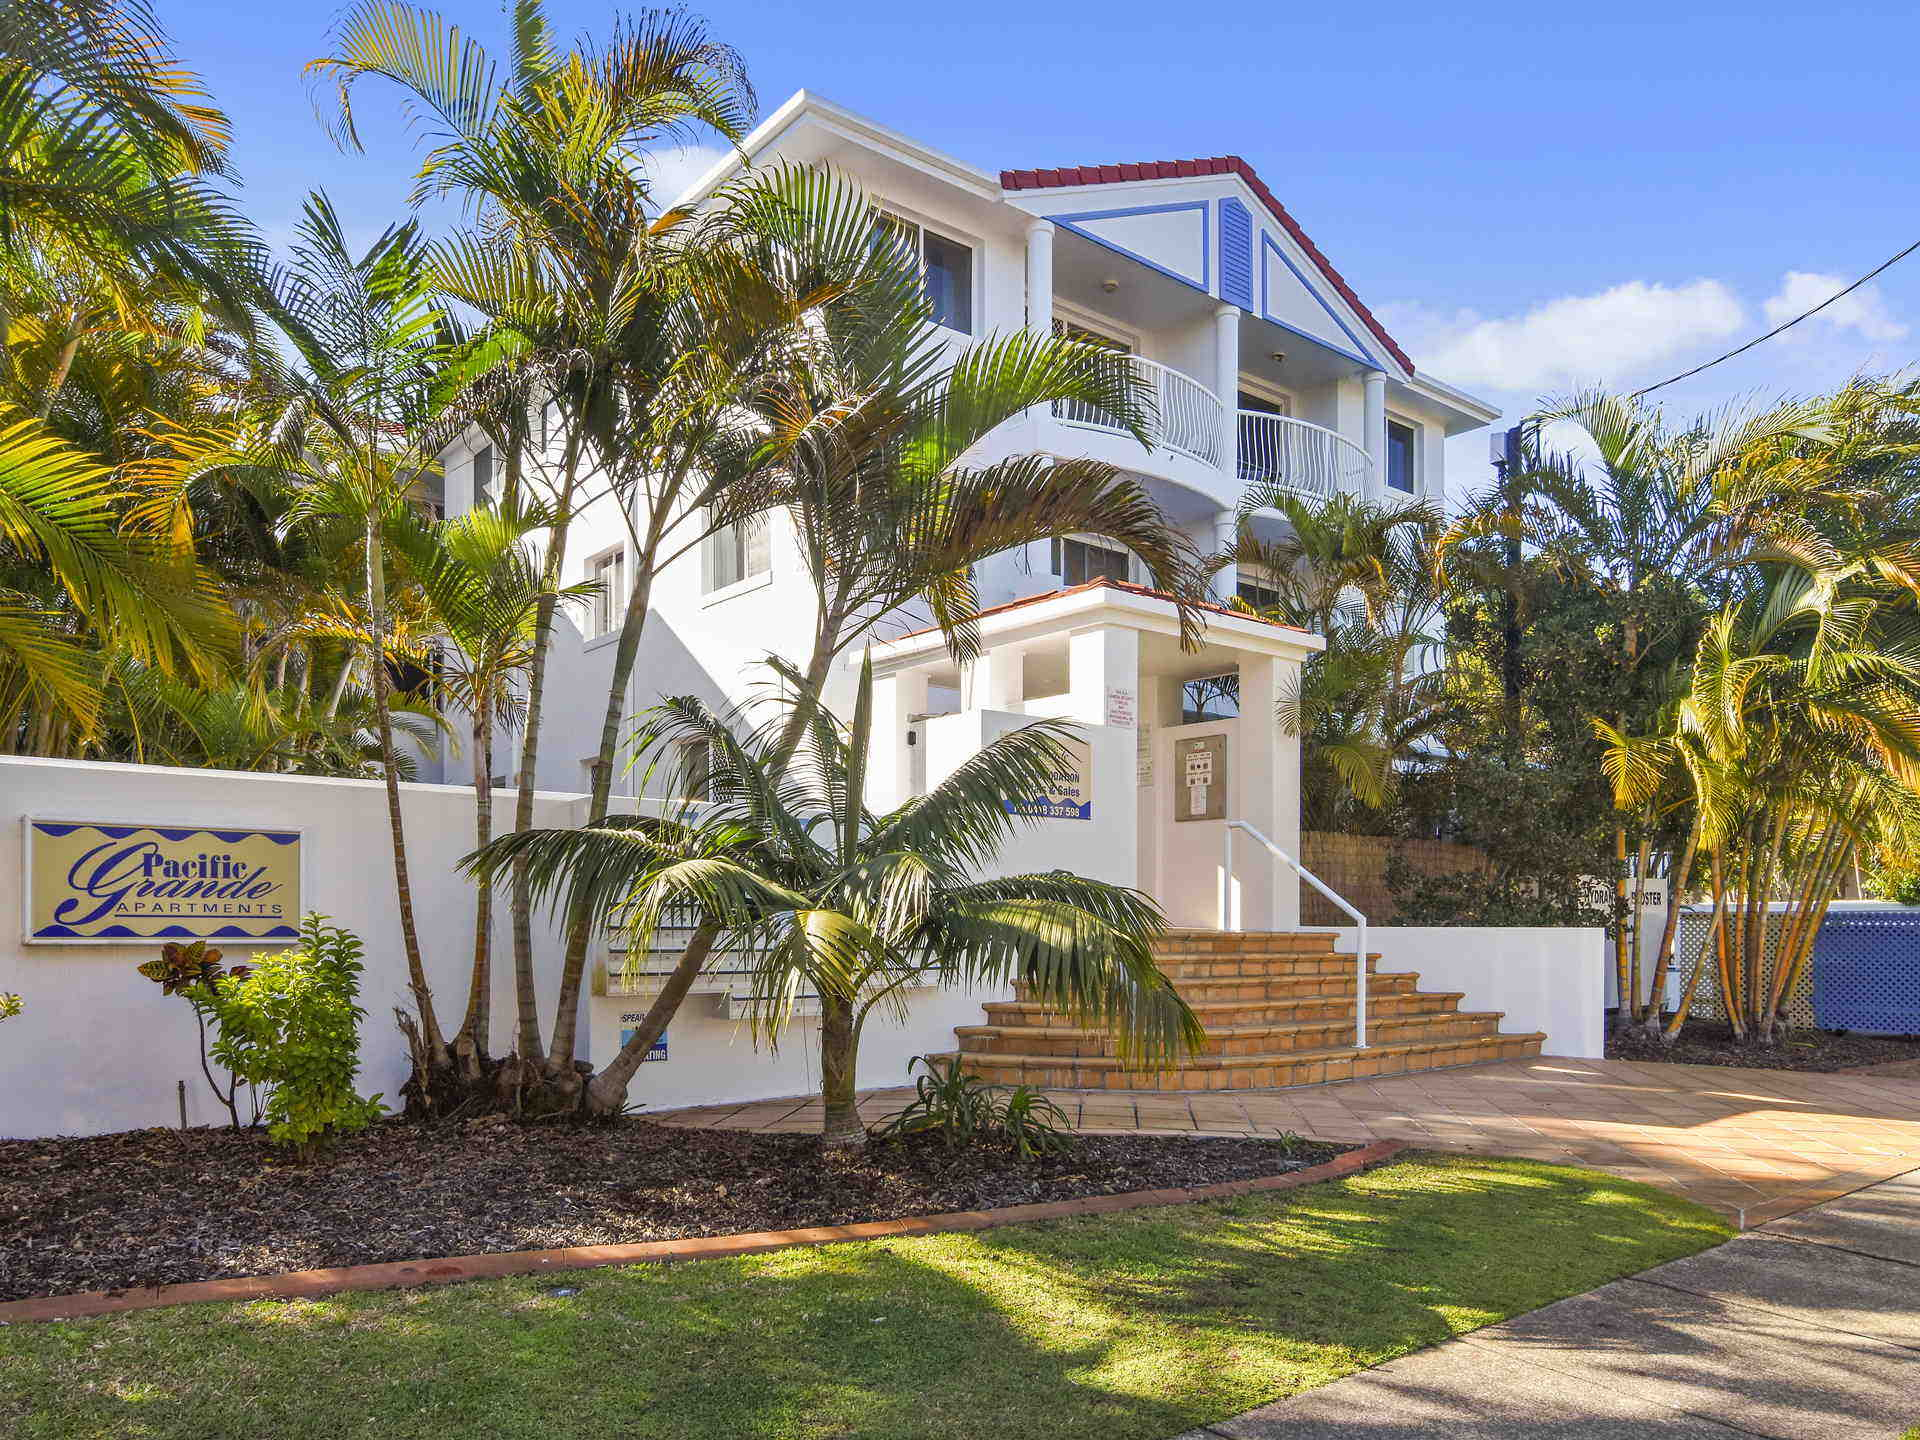 Real Estate | Gold Coast | Chevron Realty | 008 Open2view Id523271 49 7 17 Purli Street Chevron Island